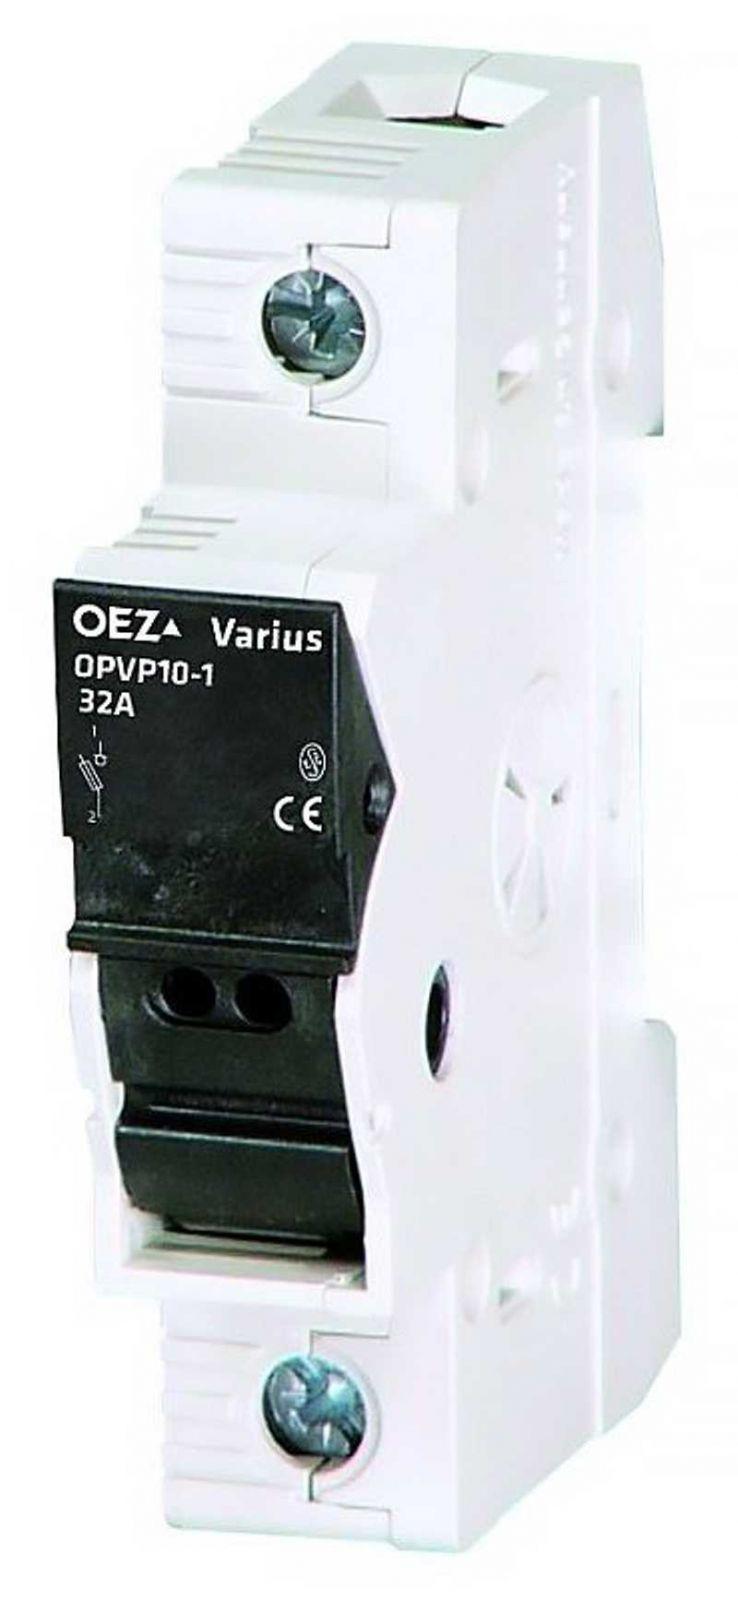 Odpínač OPVP10-1 s pojistkou 16A